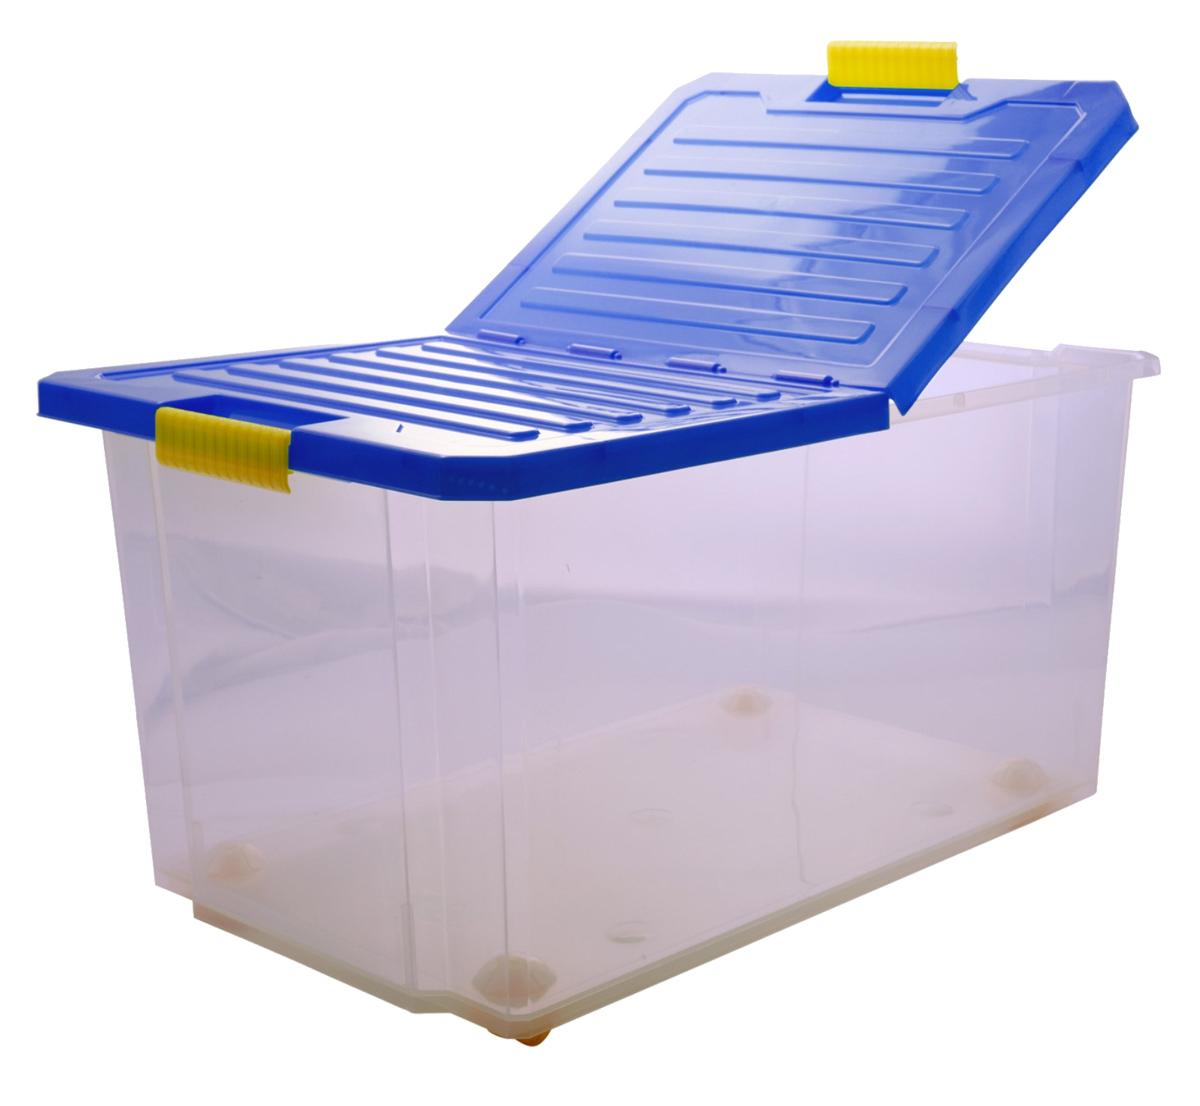 Ящик для хранения BranQ Unibox, на колесиках, цвет: синий, прозрачный, 57 л ящик для хранения branq optima на колесиках цвет синий прозрачный 57 л